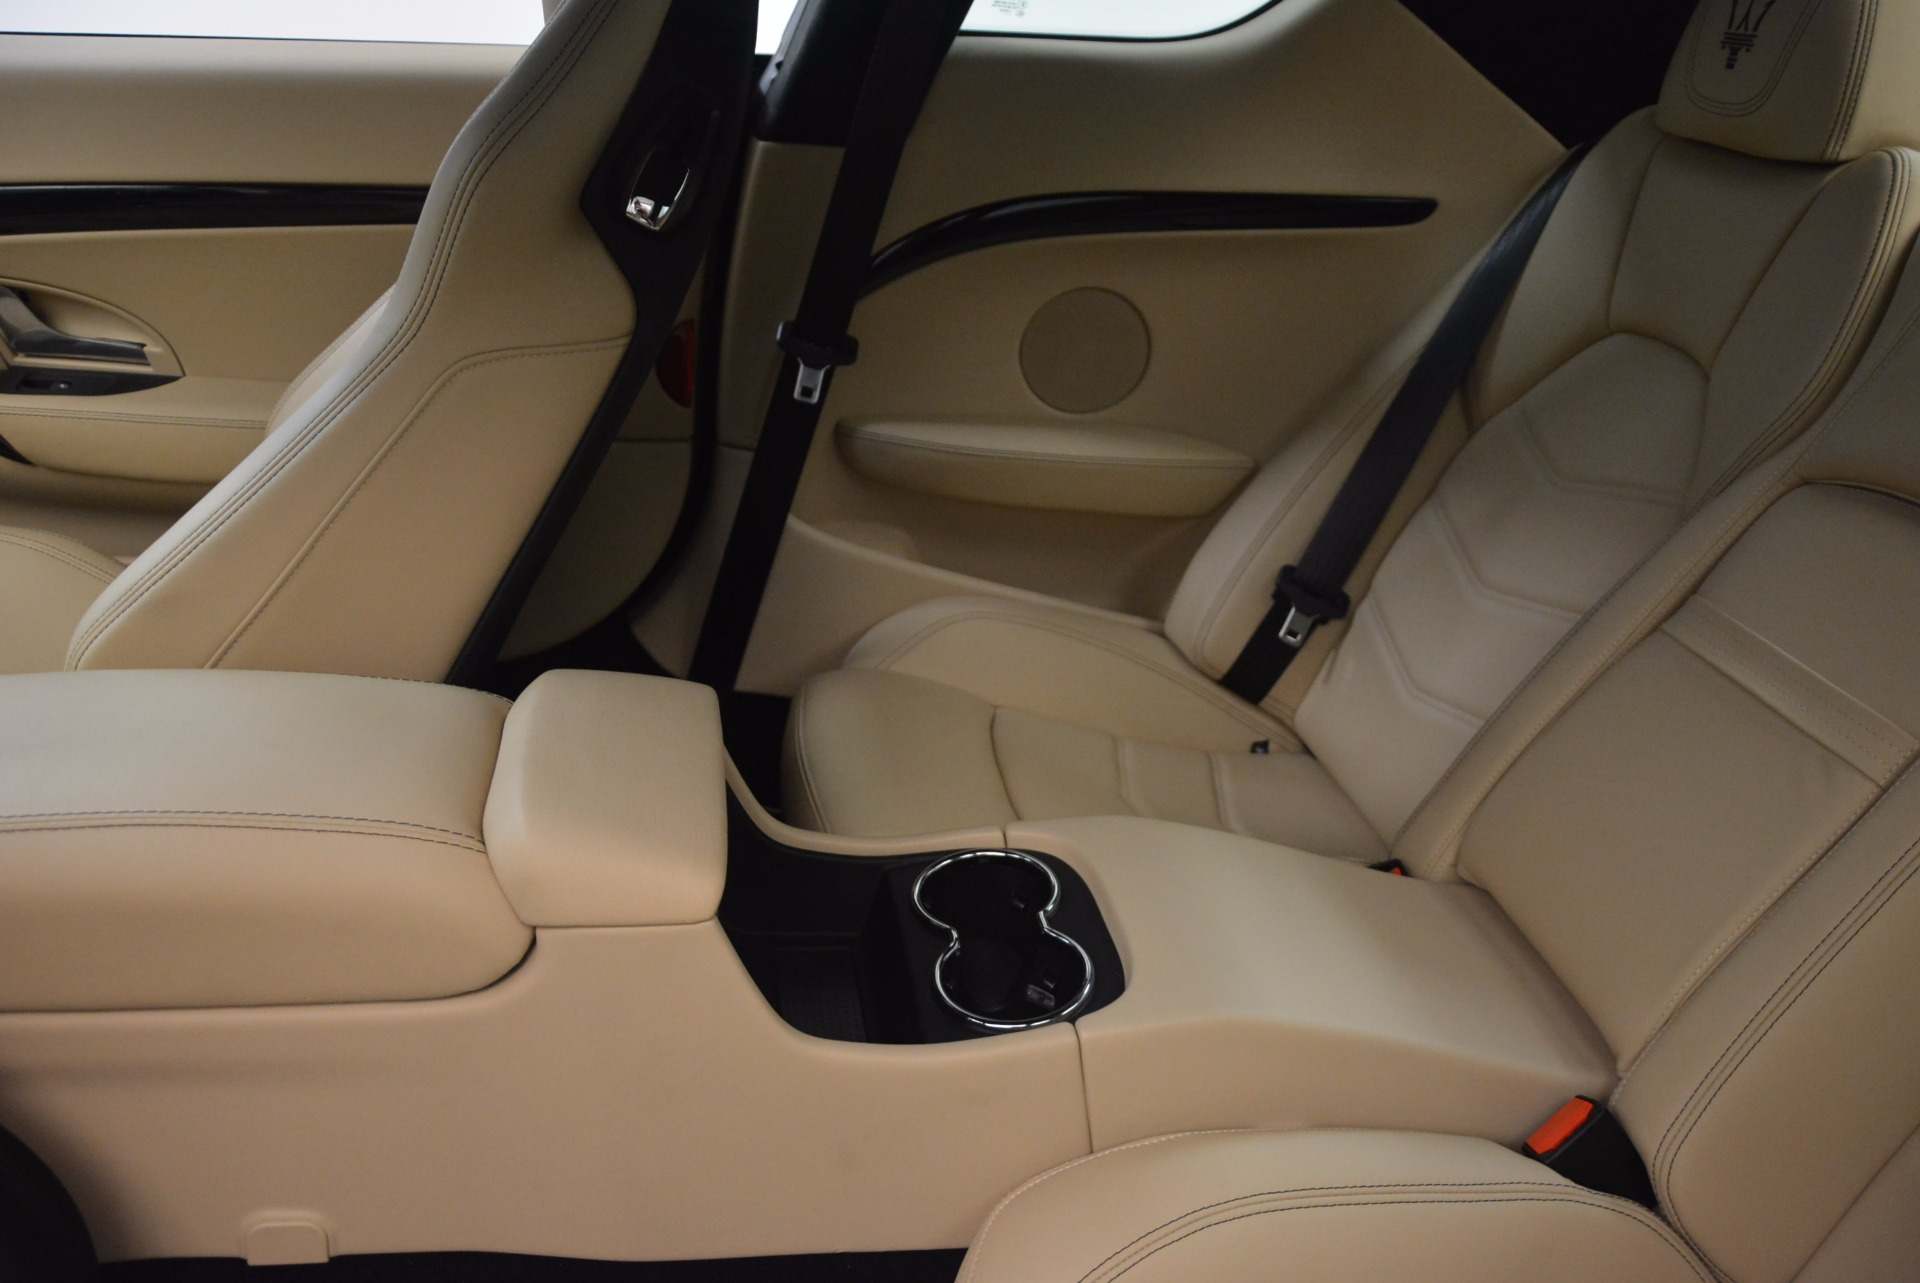 Used 2015 Maserati GranTurismo Sport Coupe For Sale In Westport, CT 1557_p17